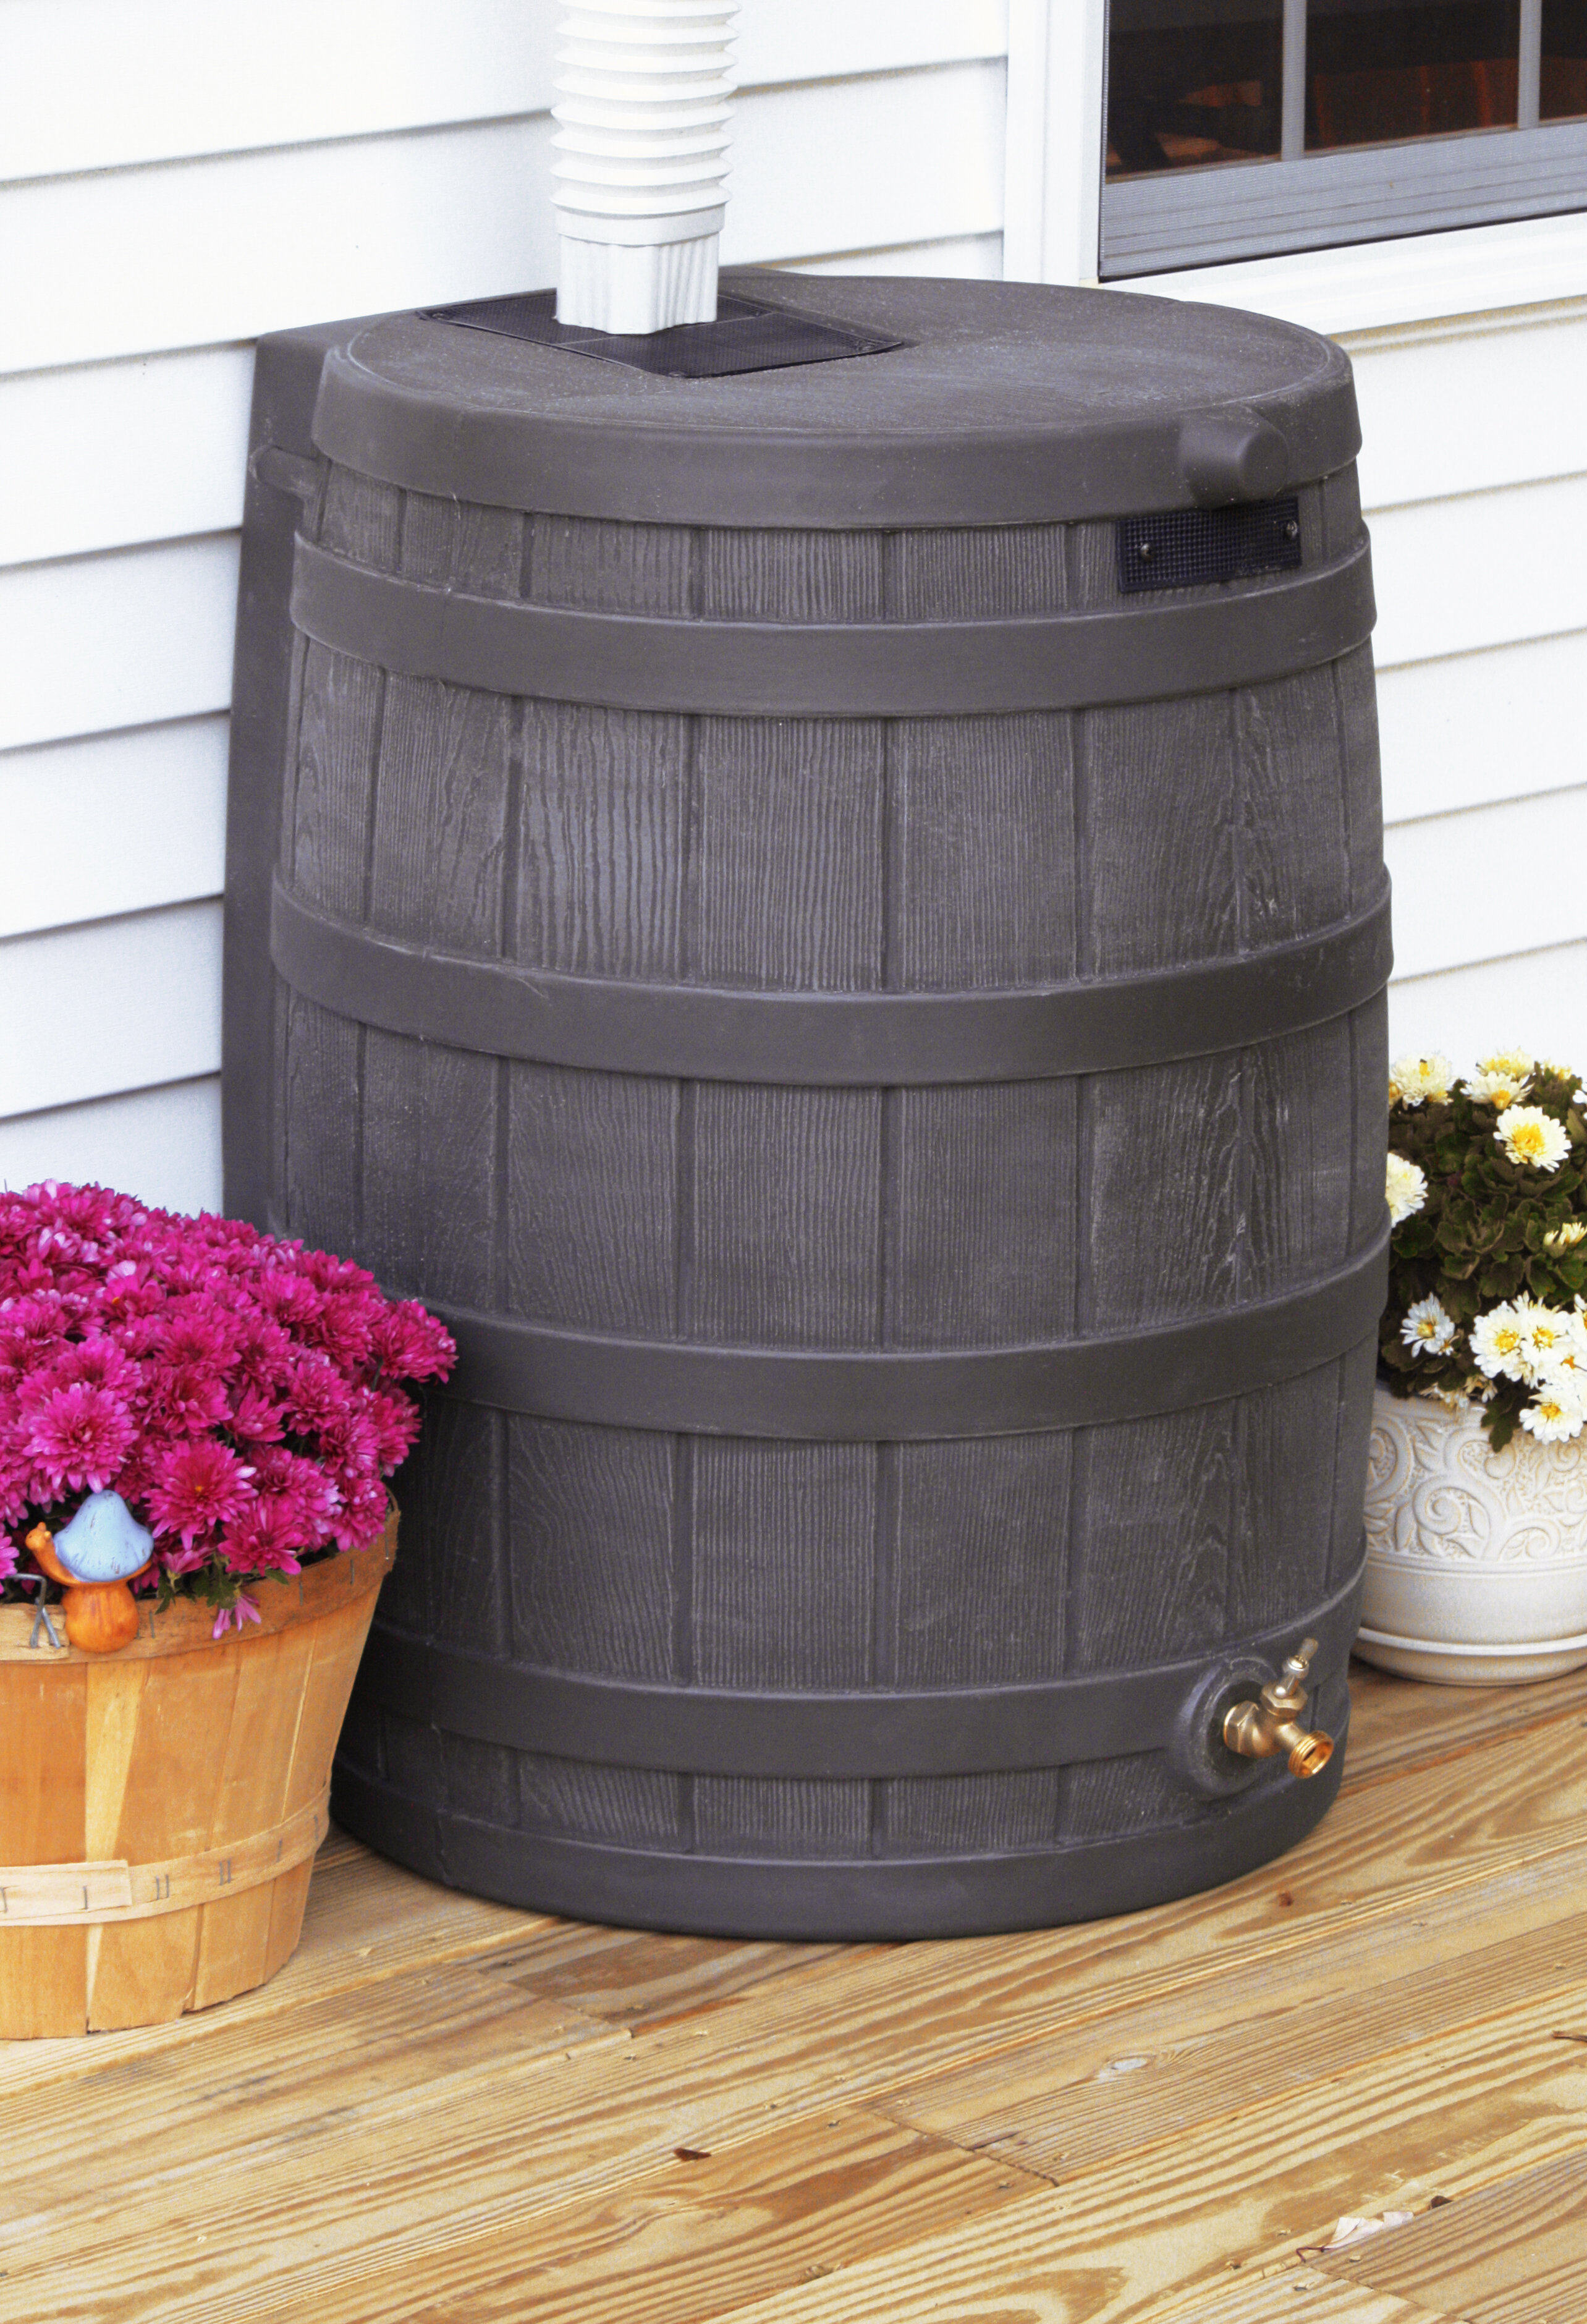 3 Pack Good Ideas Rain Wizard 50 Gallon Plastic Rain Barrel with Brass Spigot